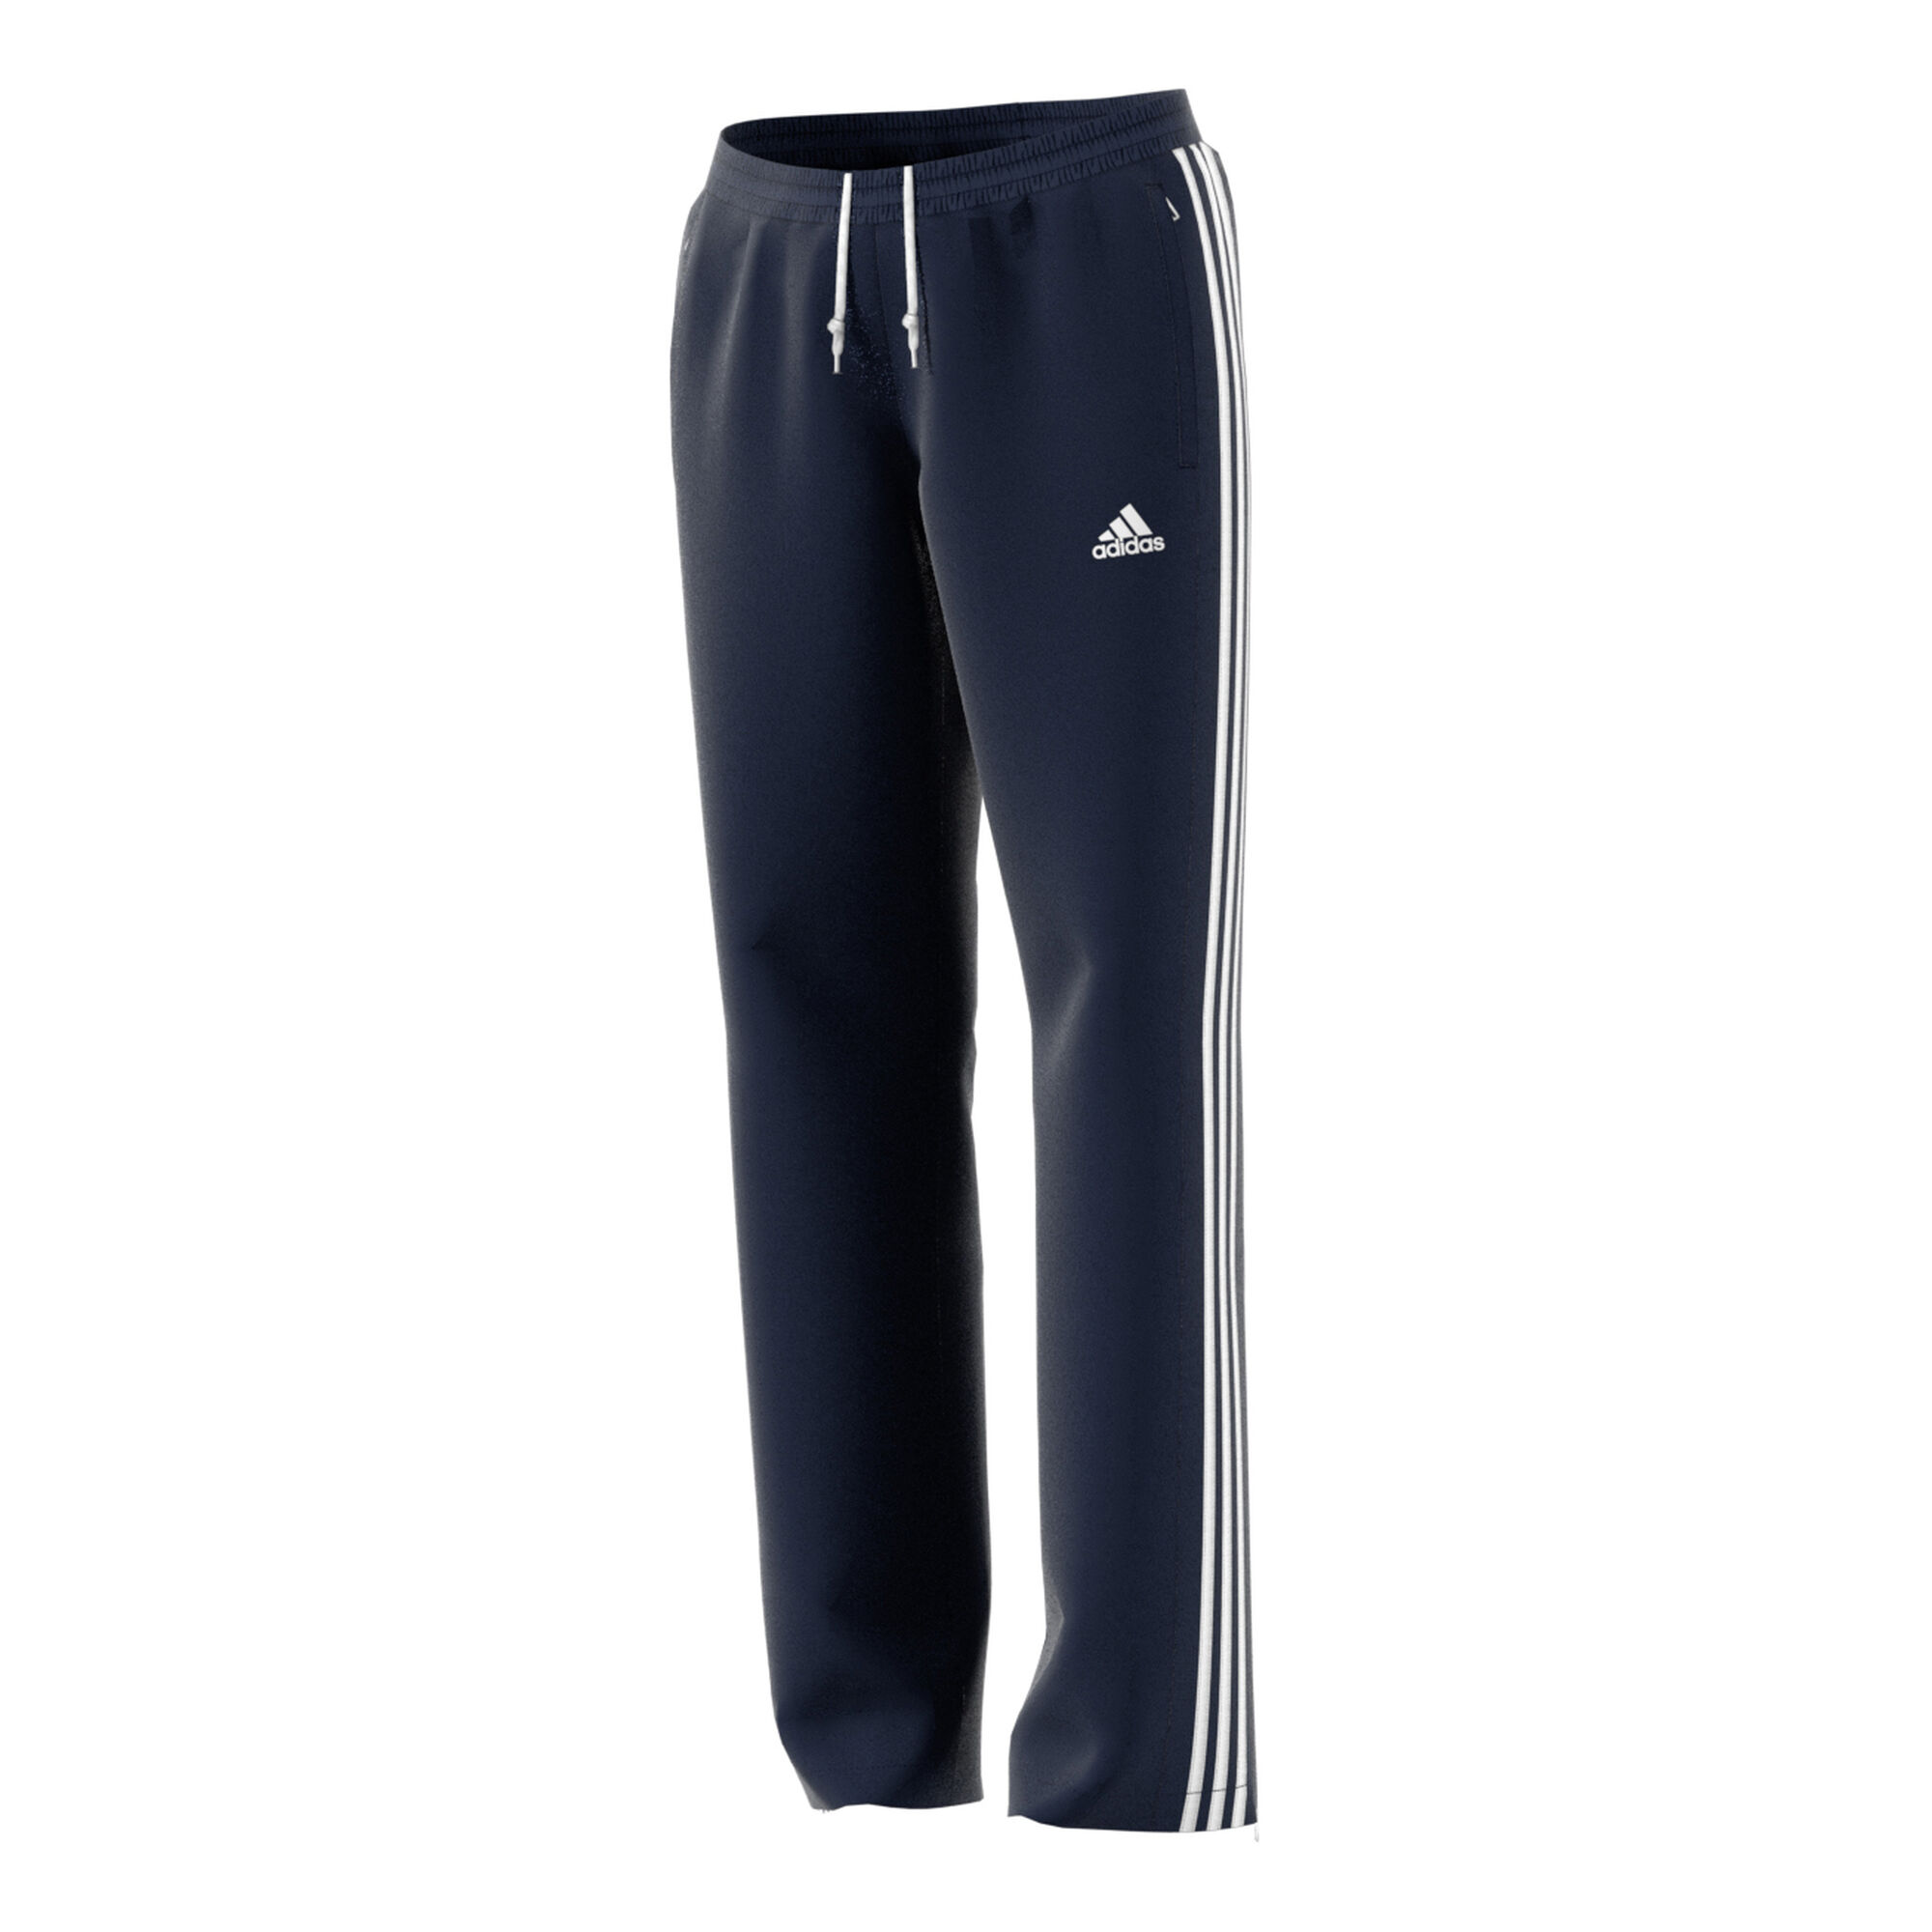 bb20321815d adidas T16 Team Pant Trainingsbroek Dames - Donkerblauw, Wit online ...